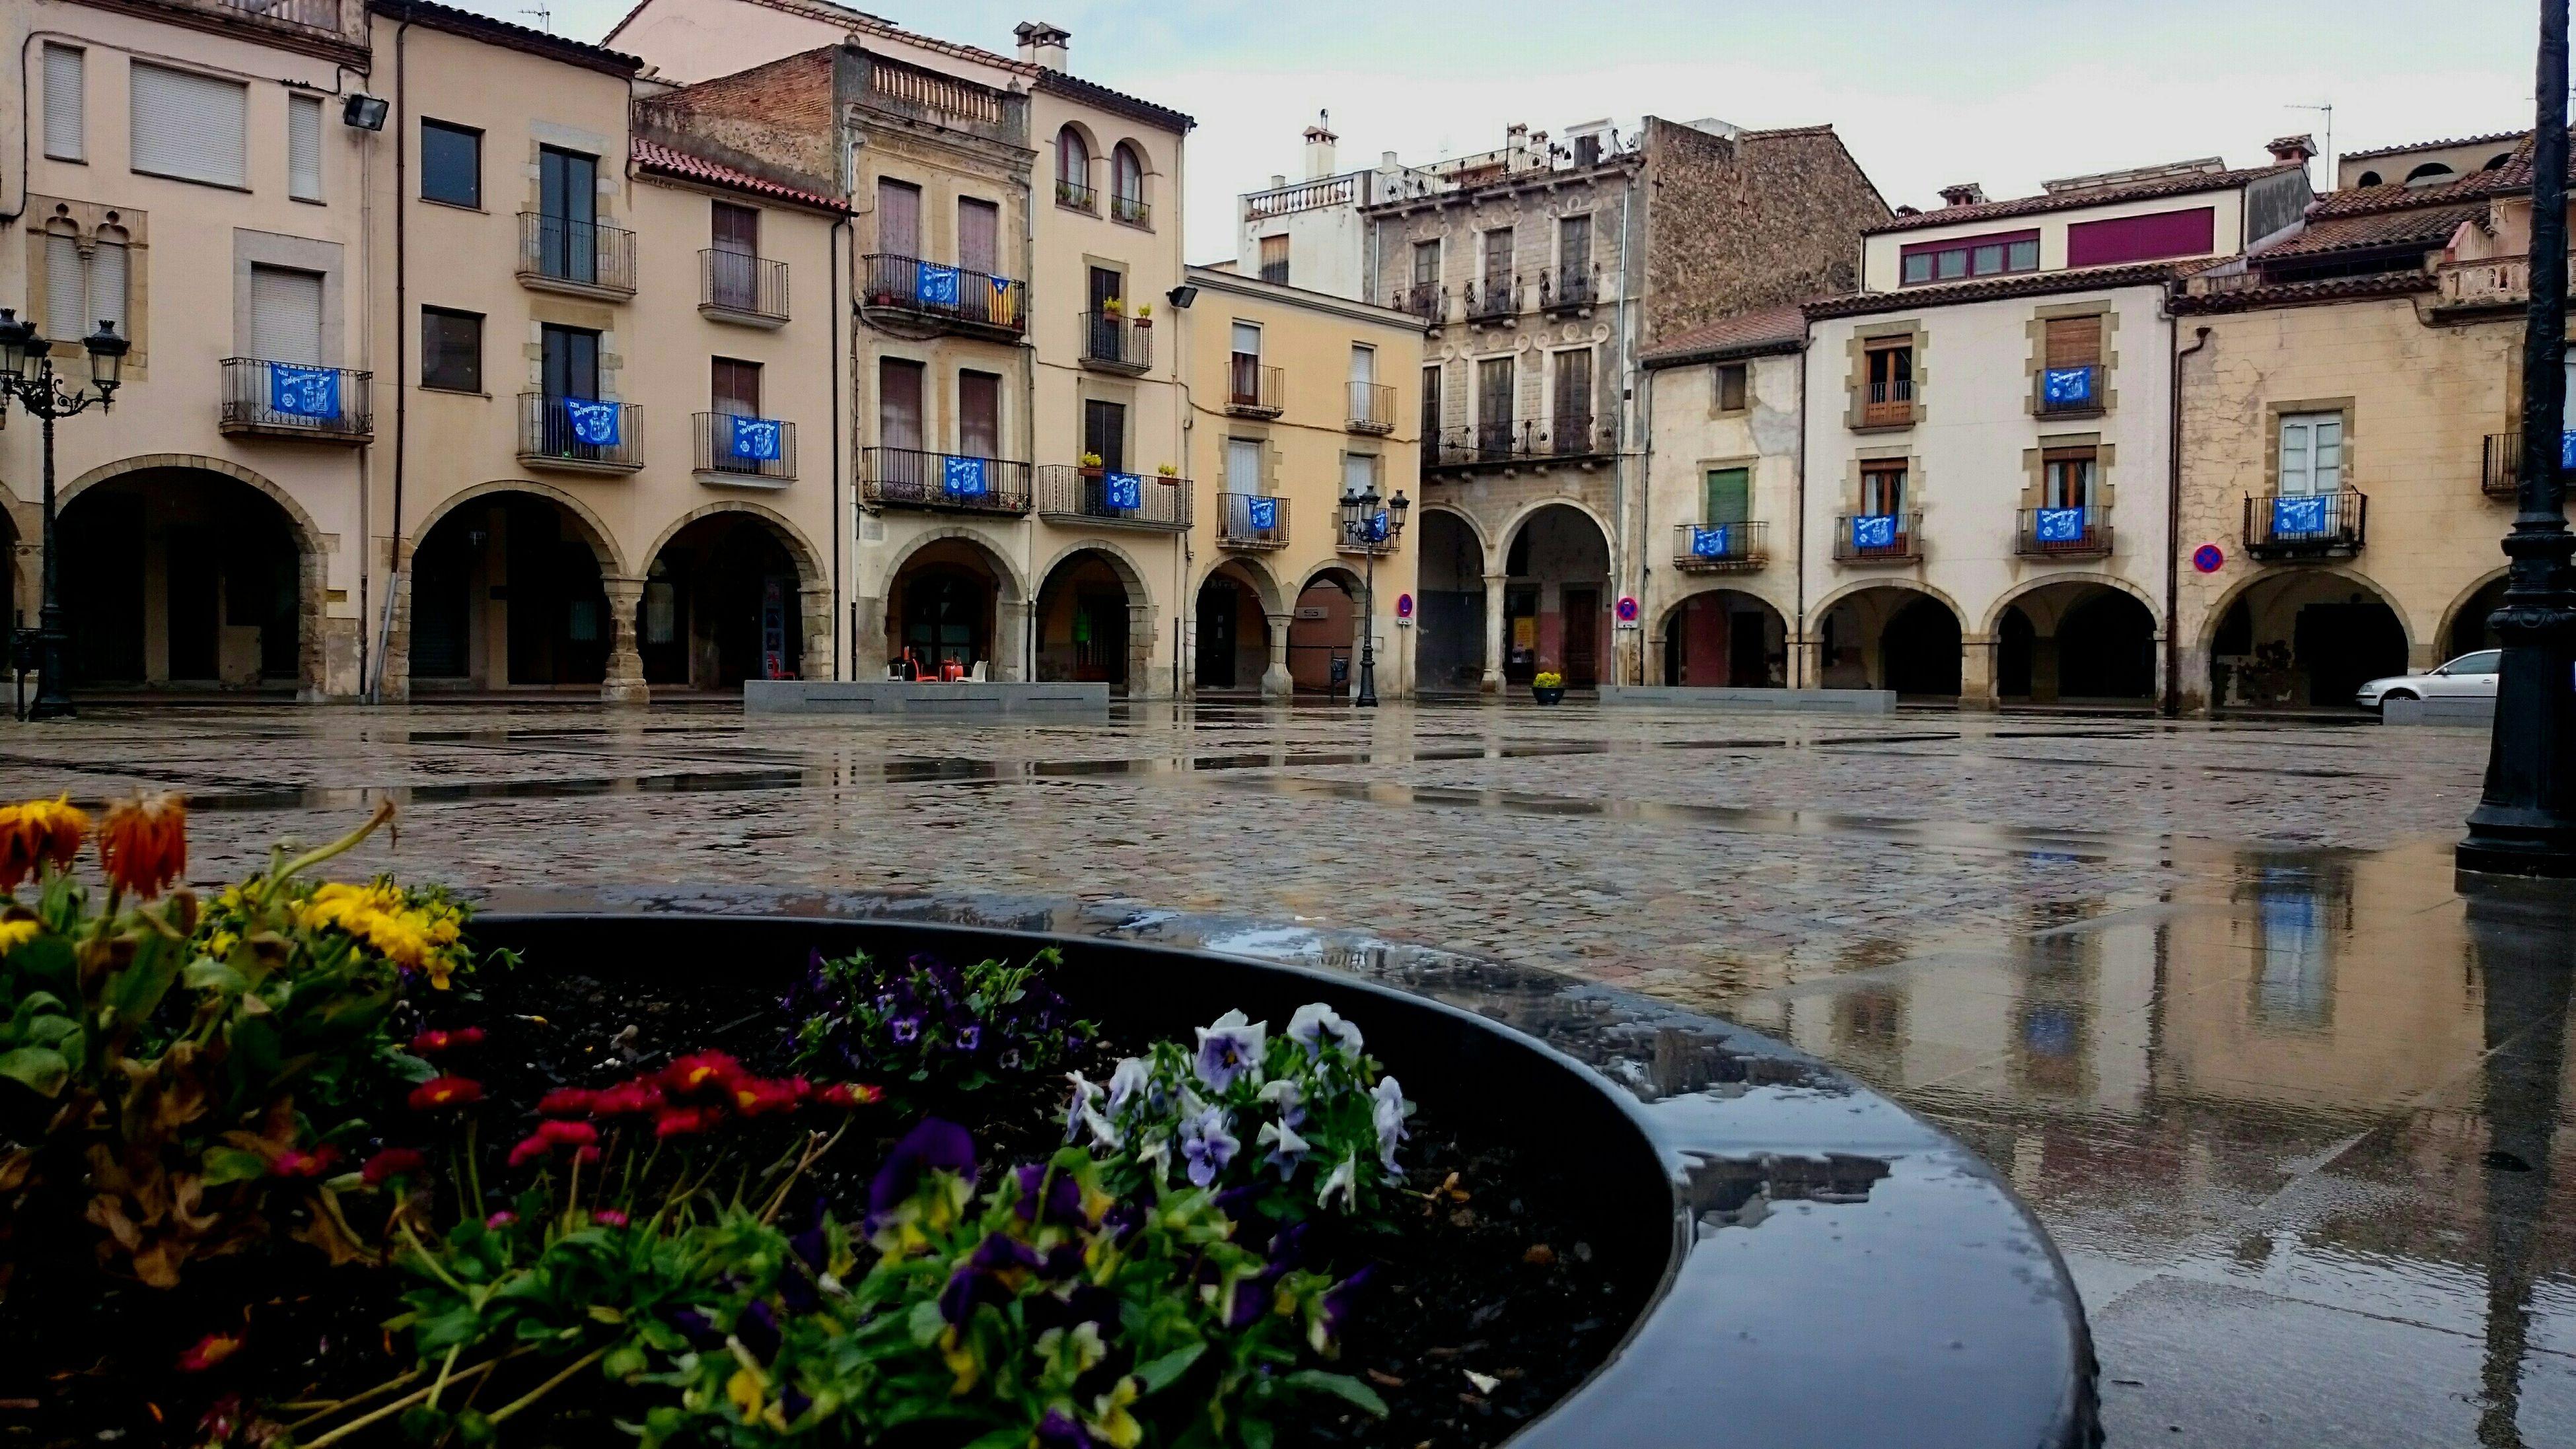 La plaza del pueblo Amer Girona Eye4photography  Photooftheday EyeEm Gallery Taking Photos Streetphotography Eyem Best Shots Flowers Rain Arquitecture